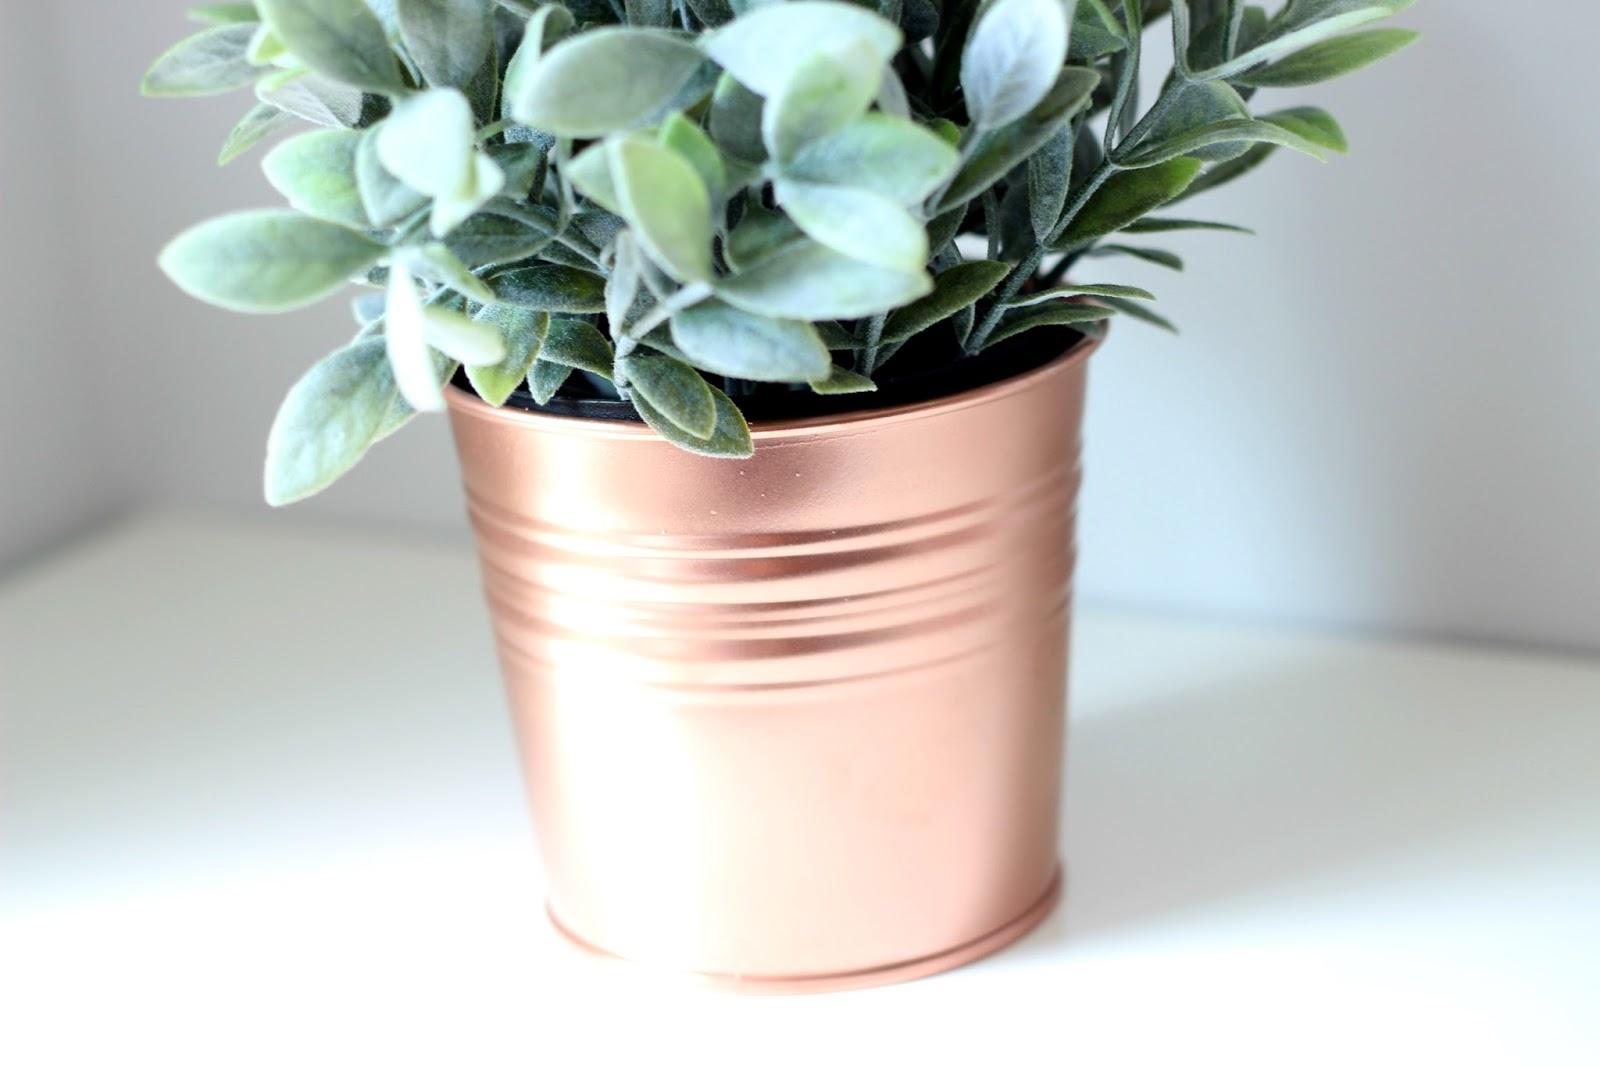 A picture of a DIY Copper Ikea Plant Pot